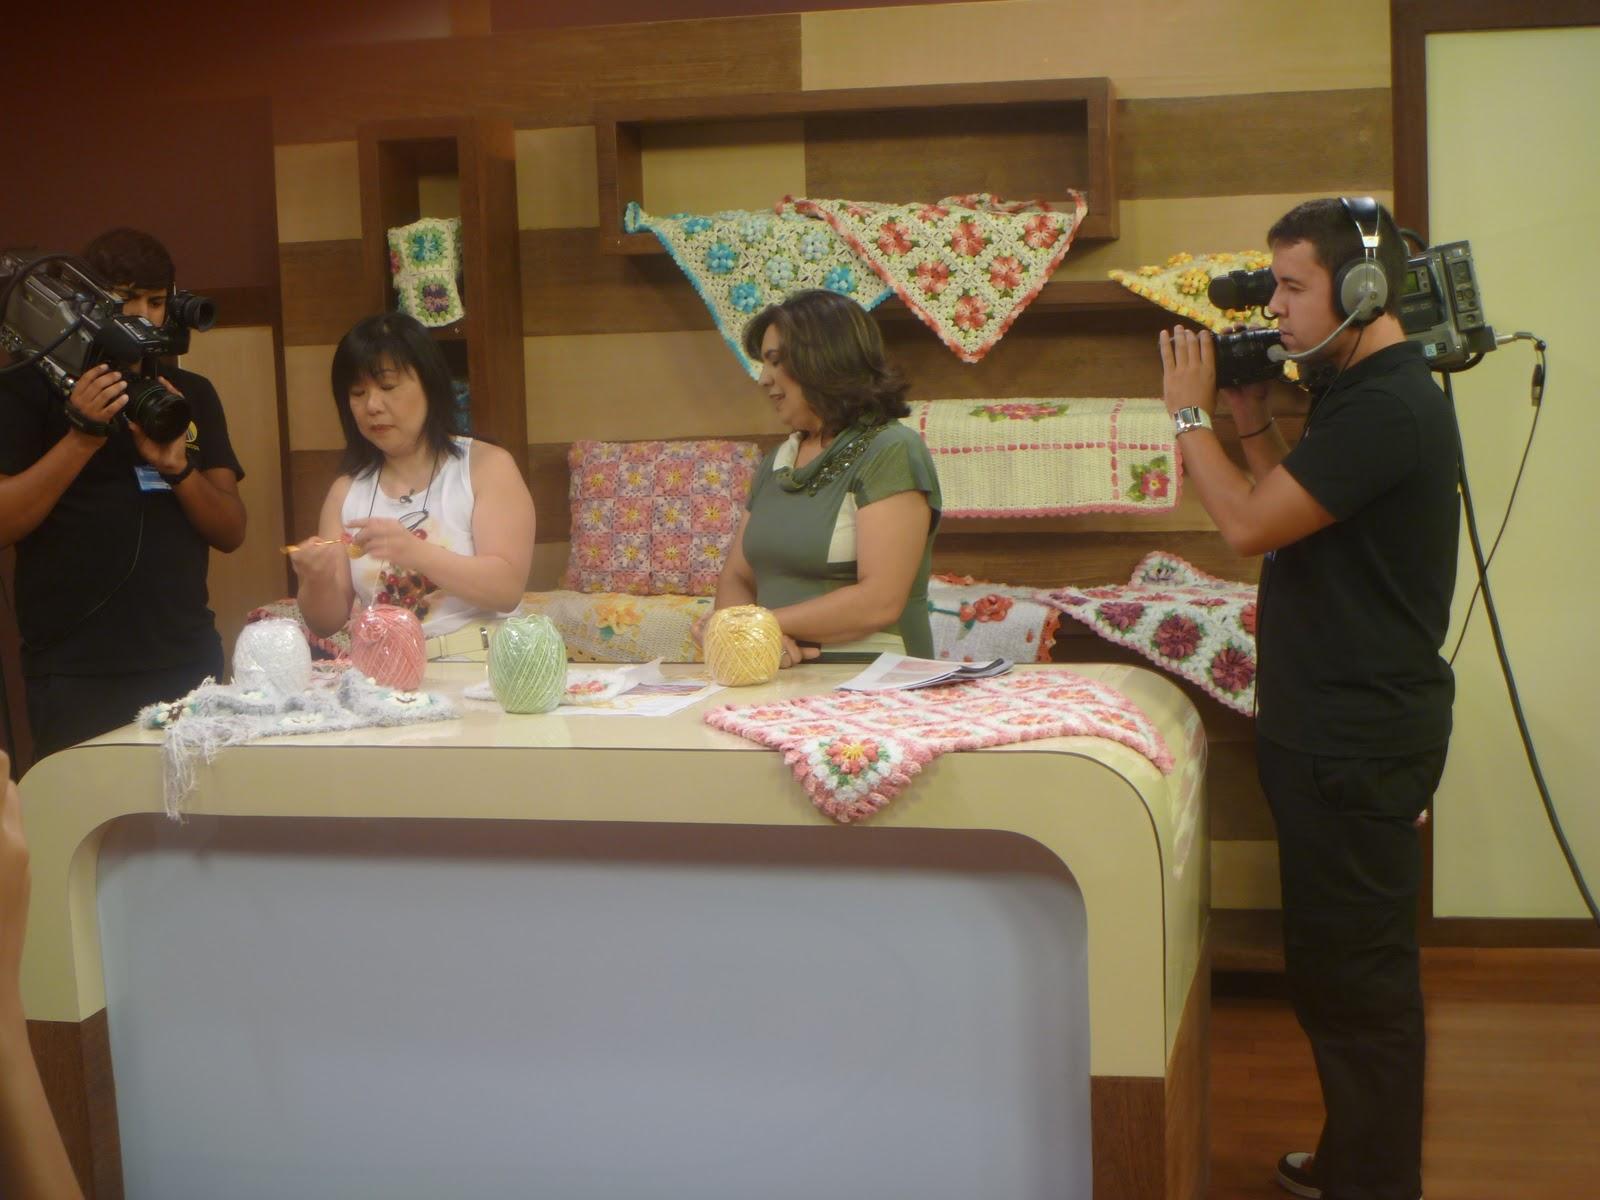 Tv Aparecida - Programa Sabor de Vida 25/03/2011